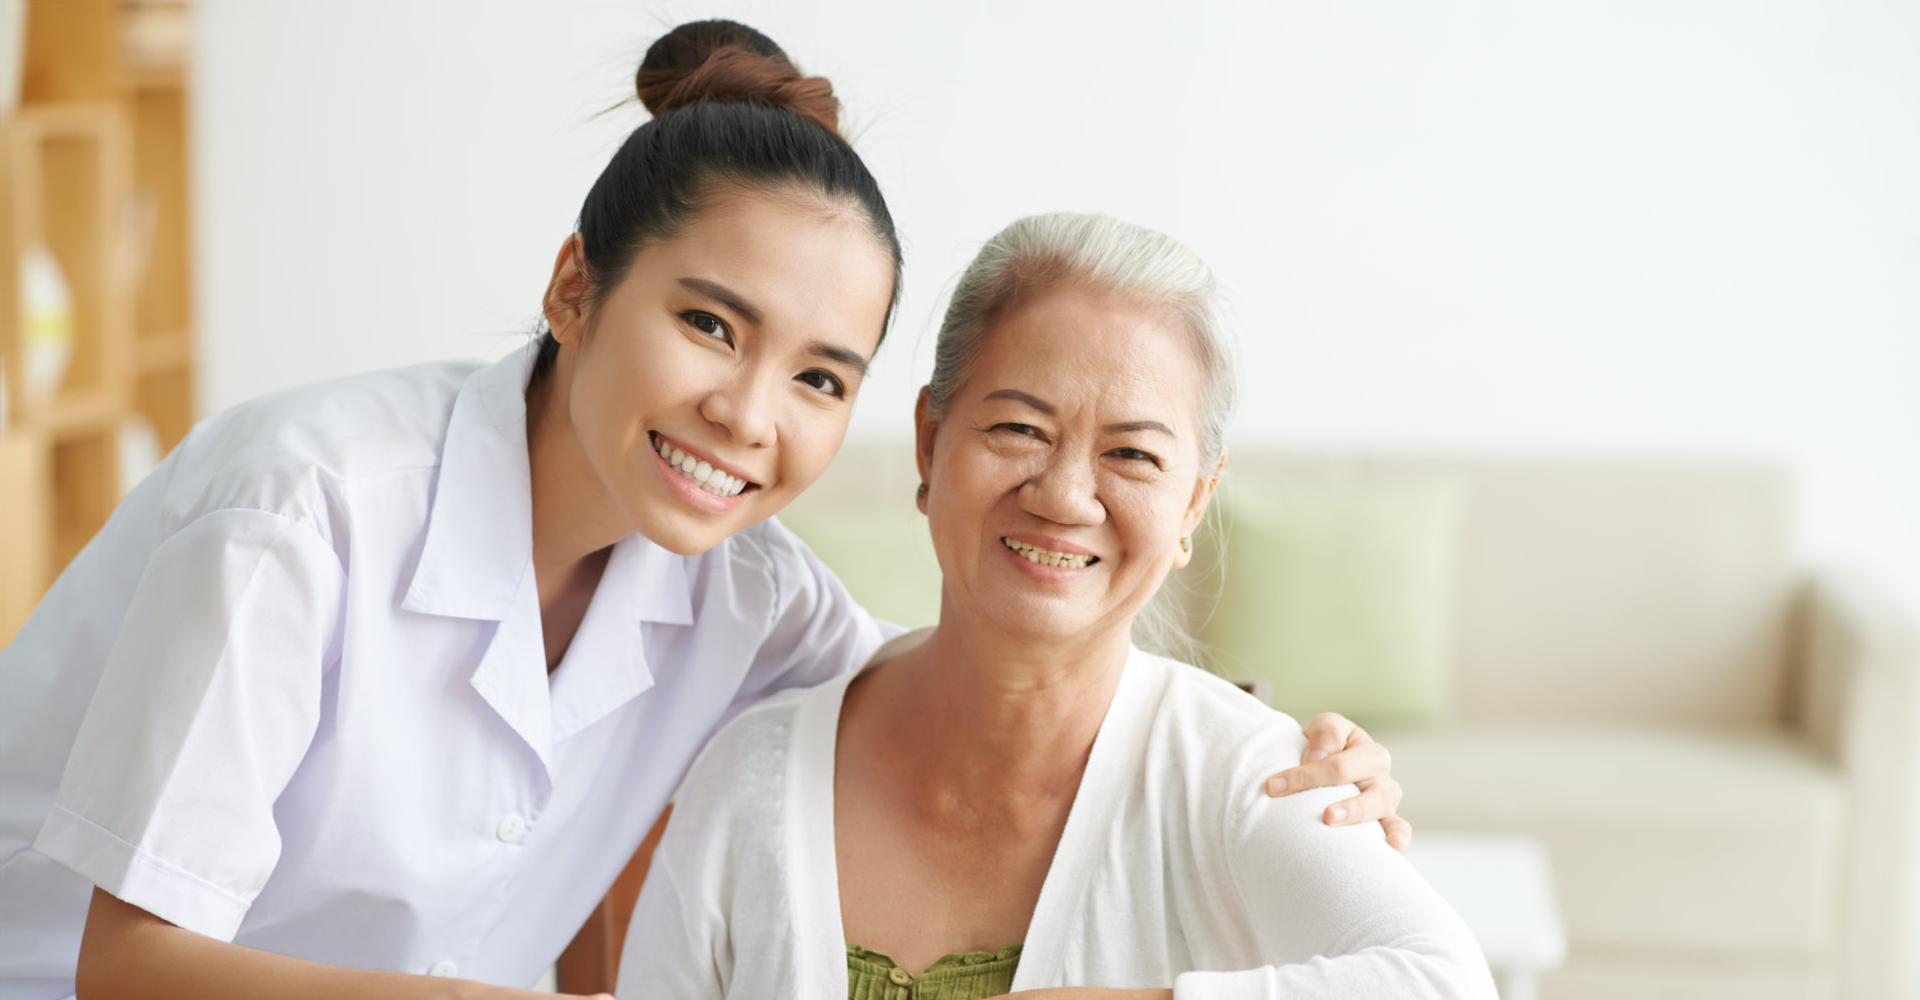 Caregiver and Senior Women smiling